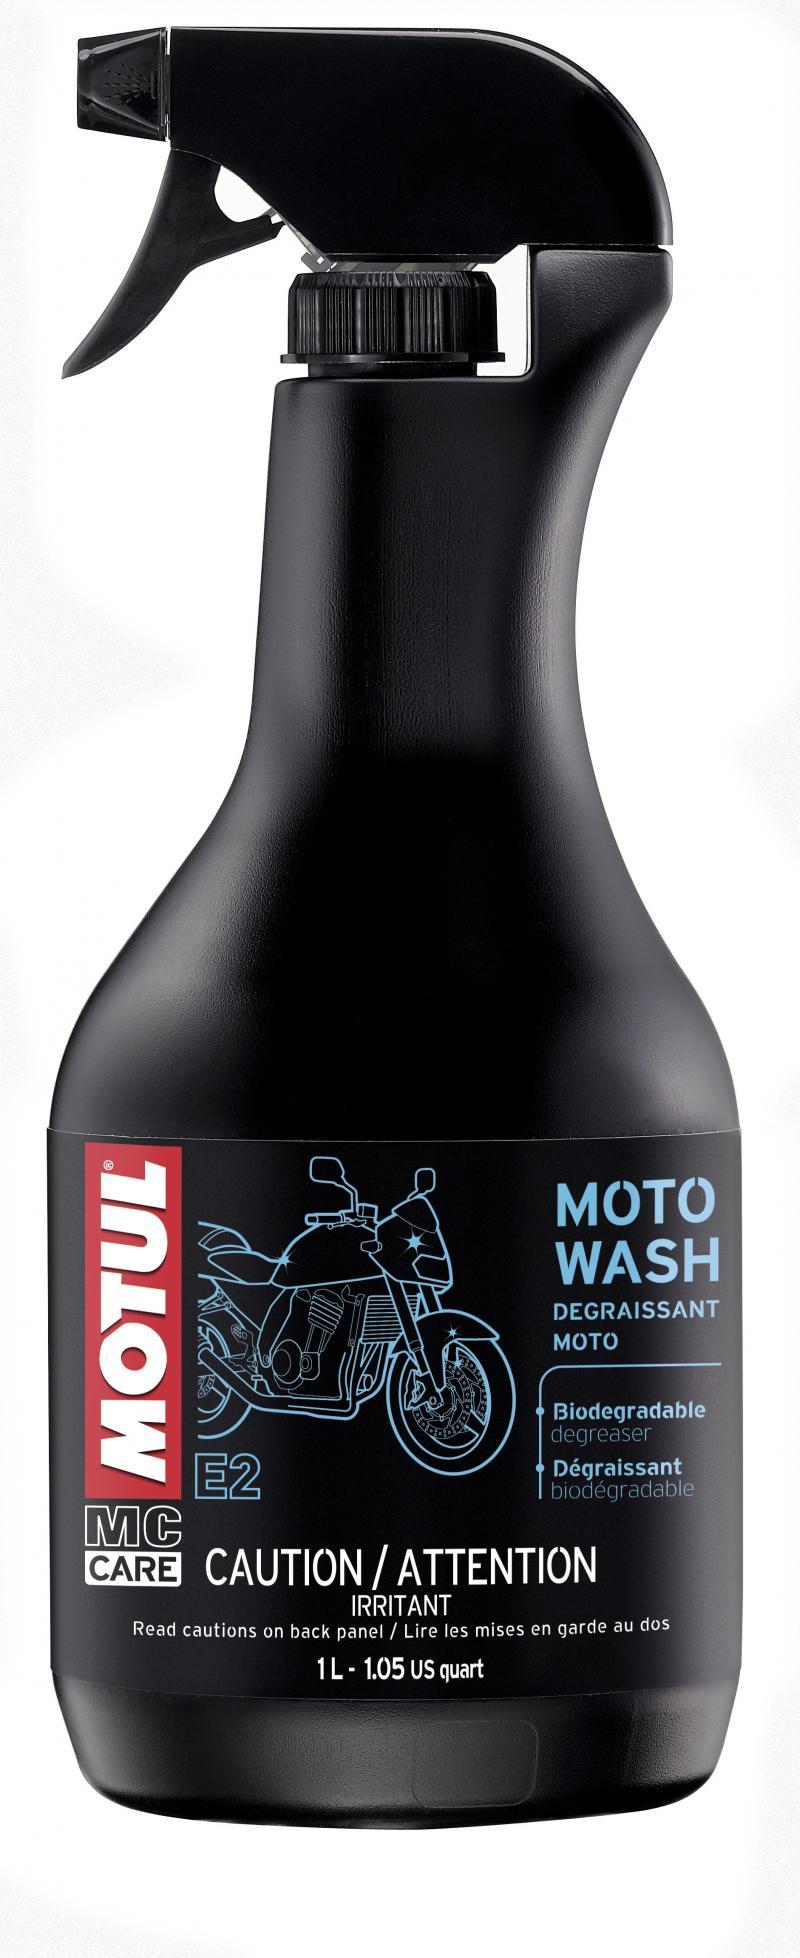 Motul E2 MOTO WASH - 1L US CAN